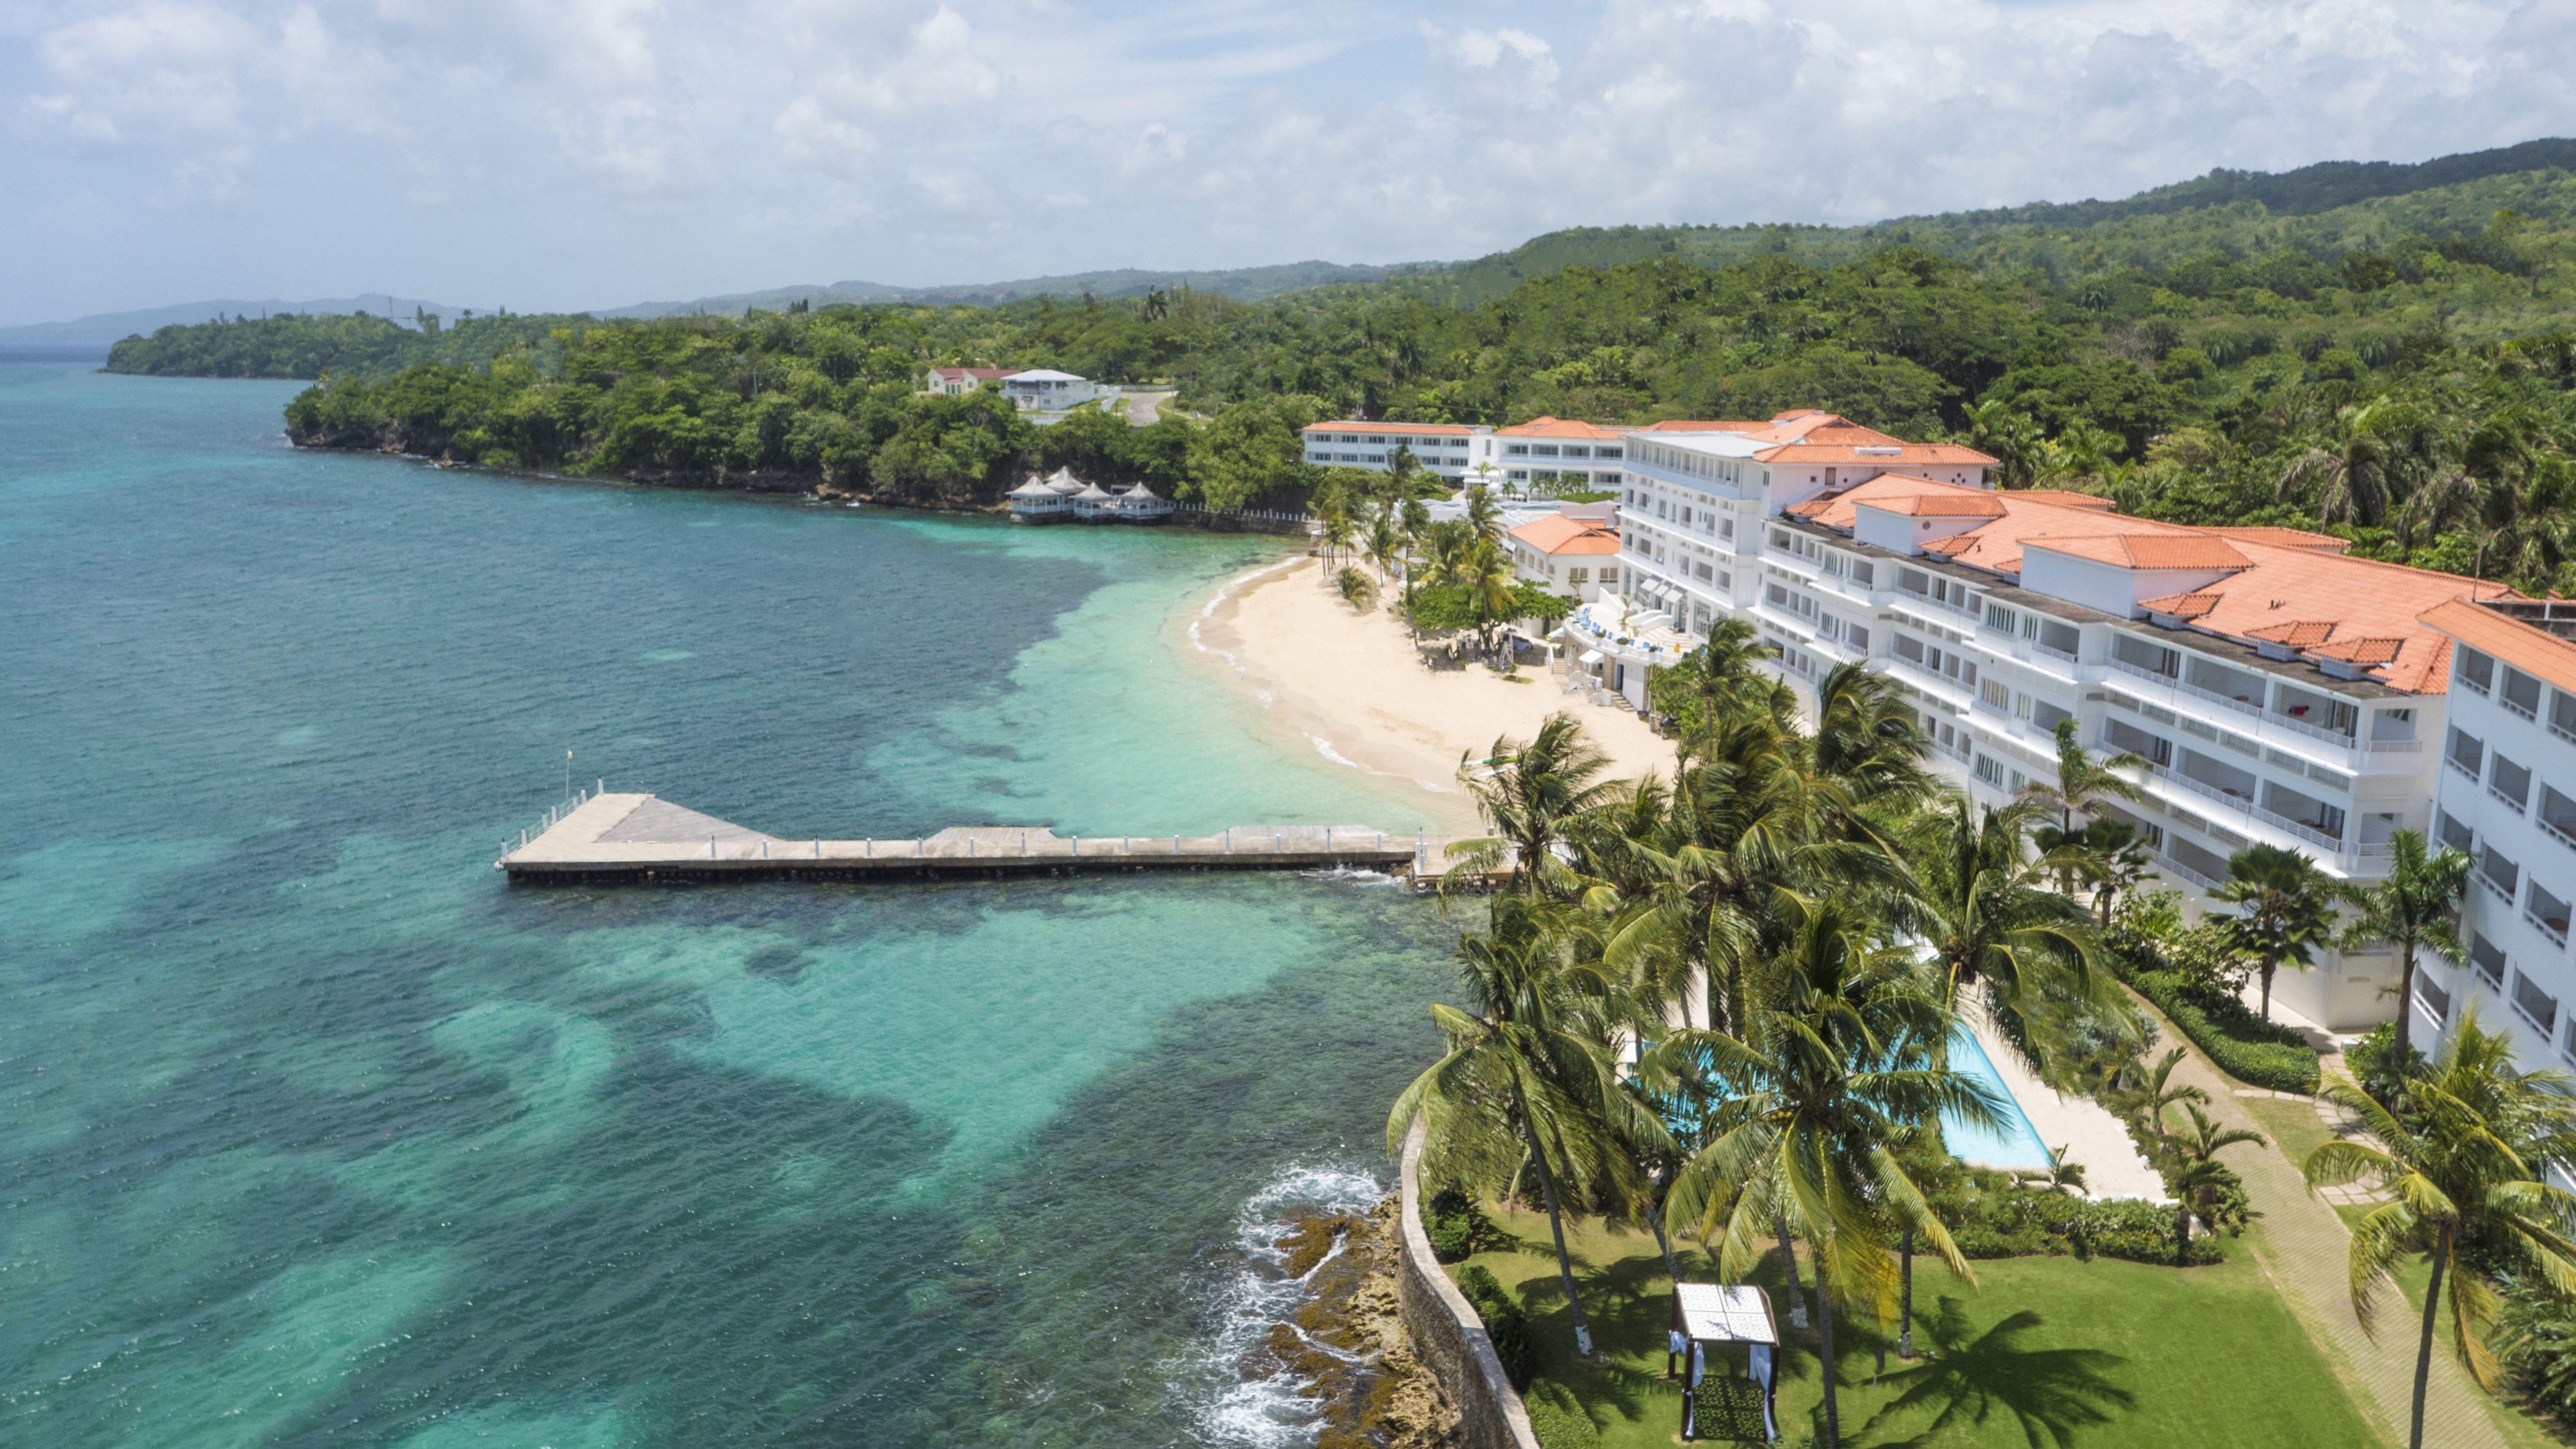 S Tower Isle Is A Honeymoon Resort On The Caribbean Island Of Jamaica